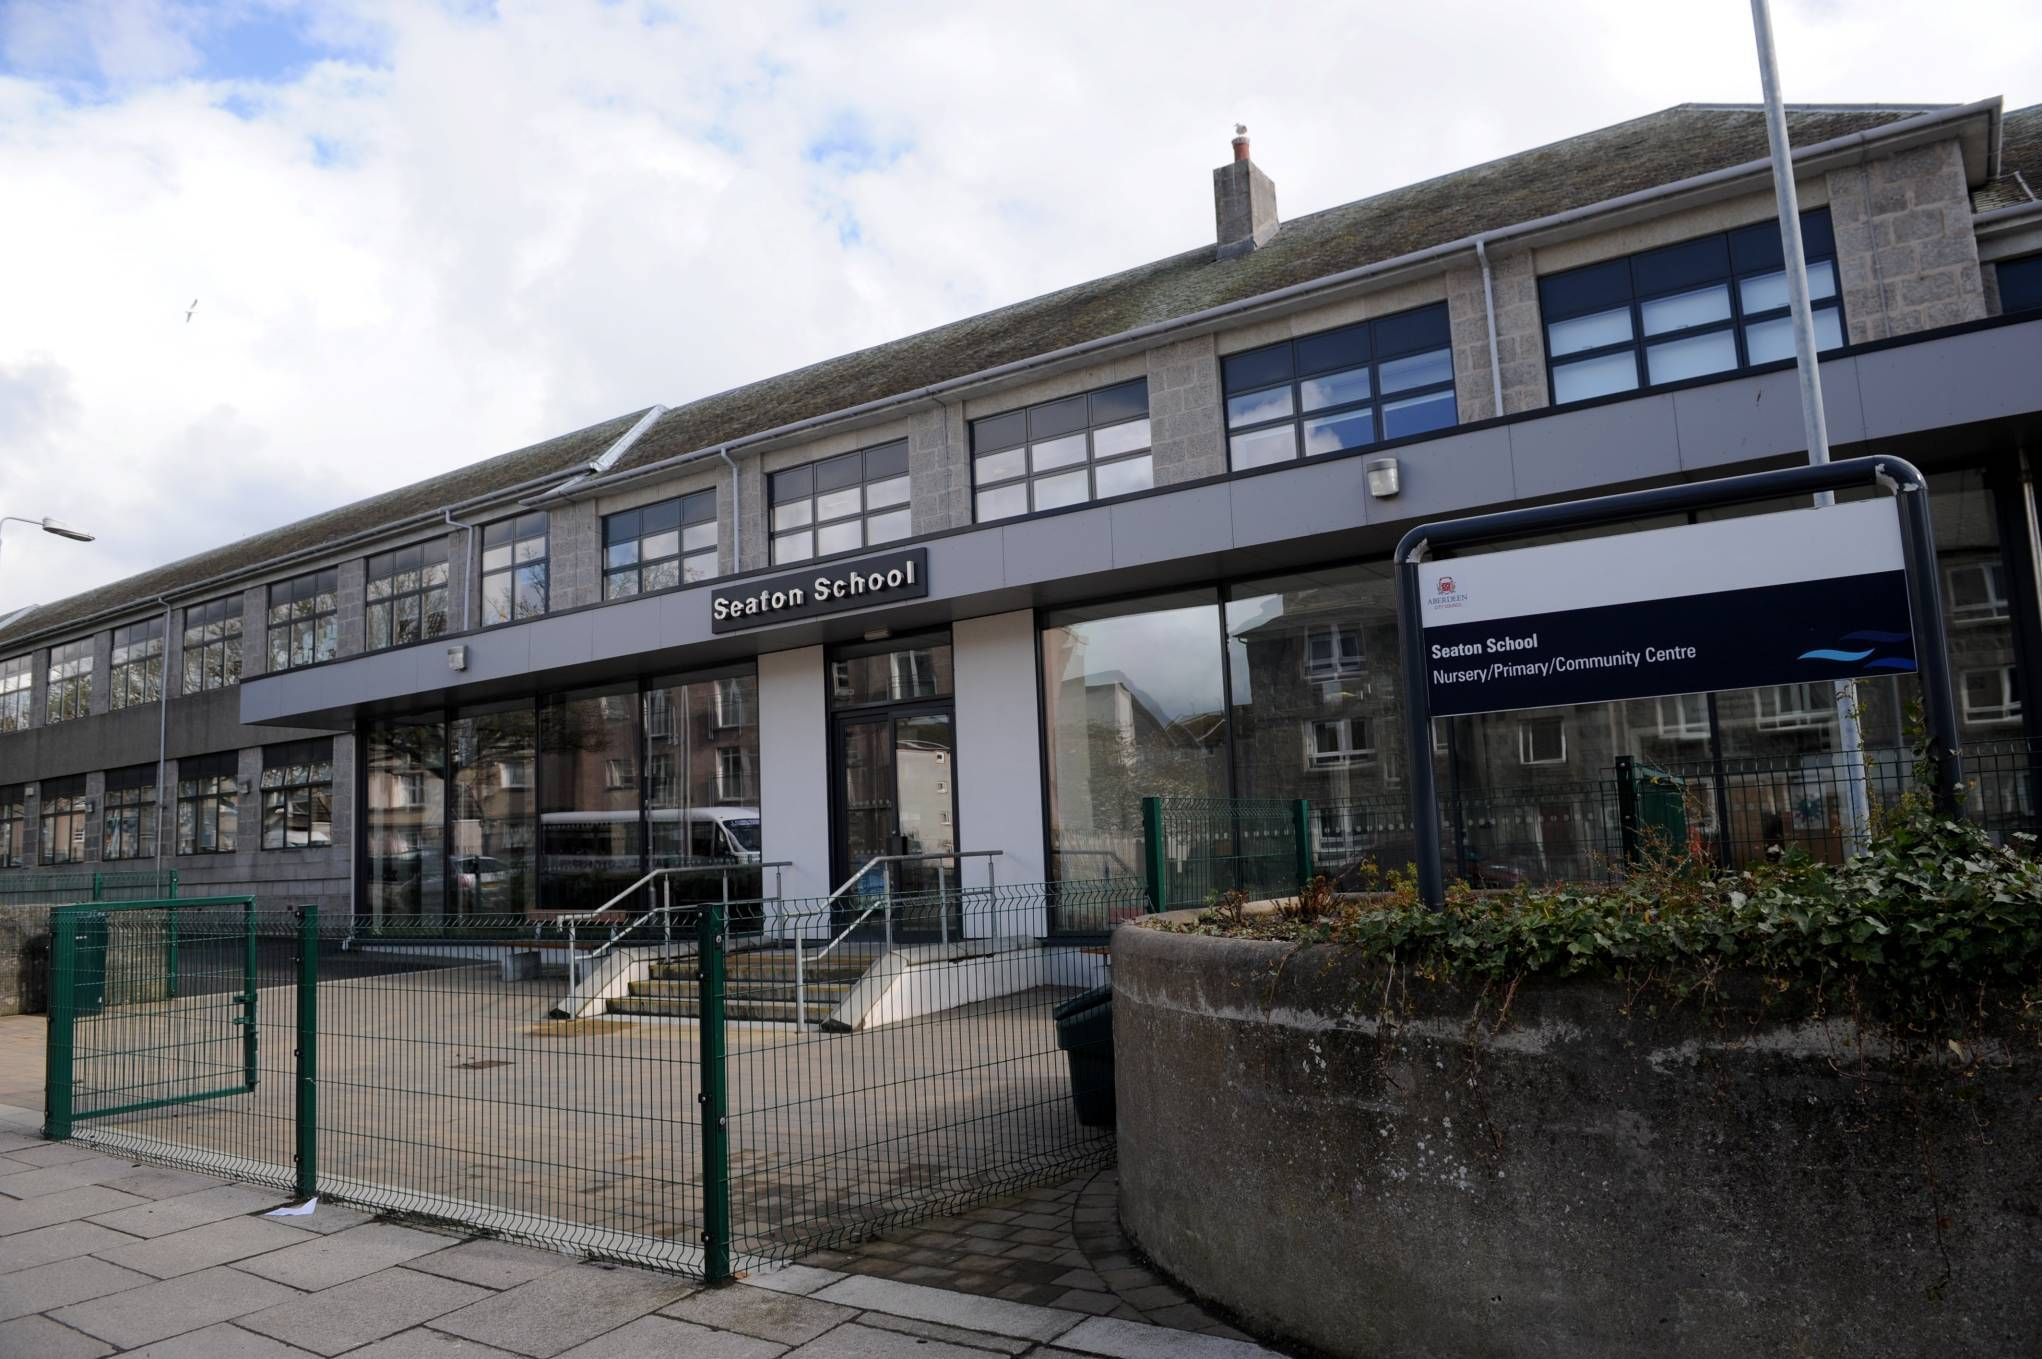 Seaton School will run its own Big Breakfast for pupils